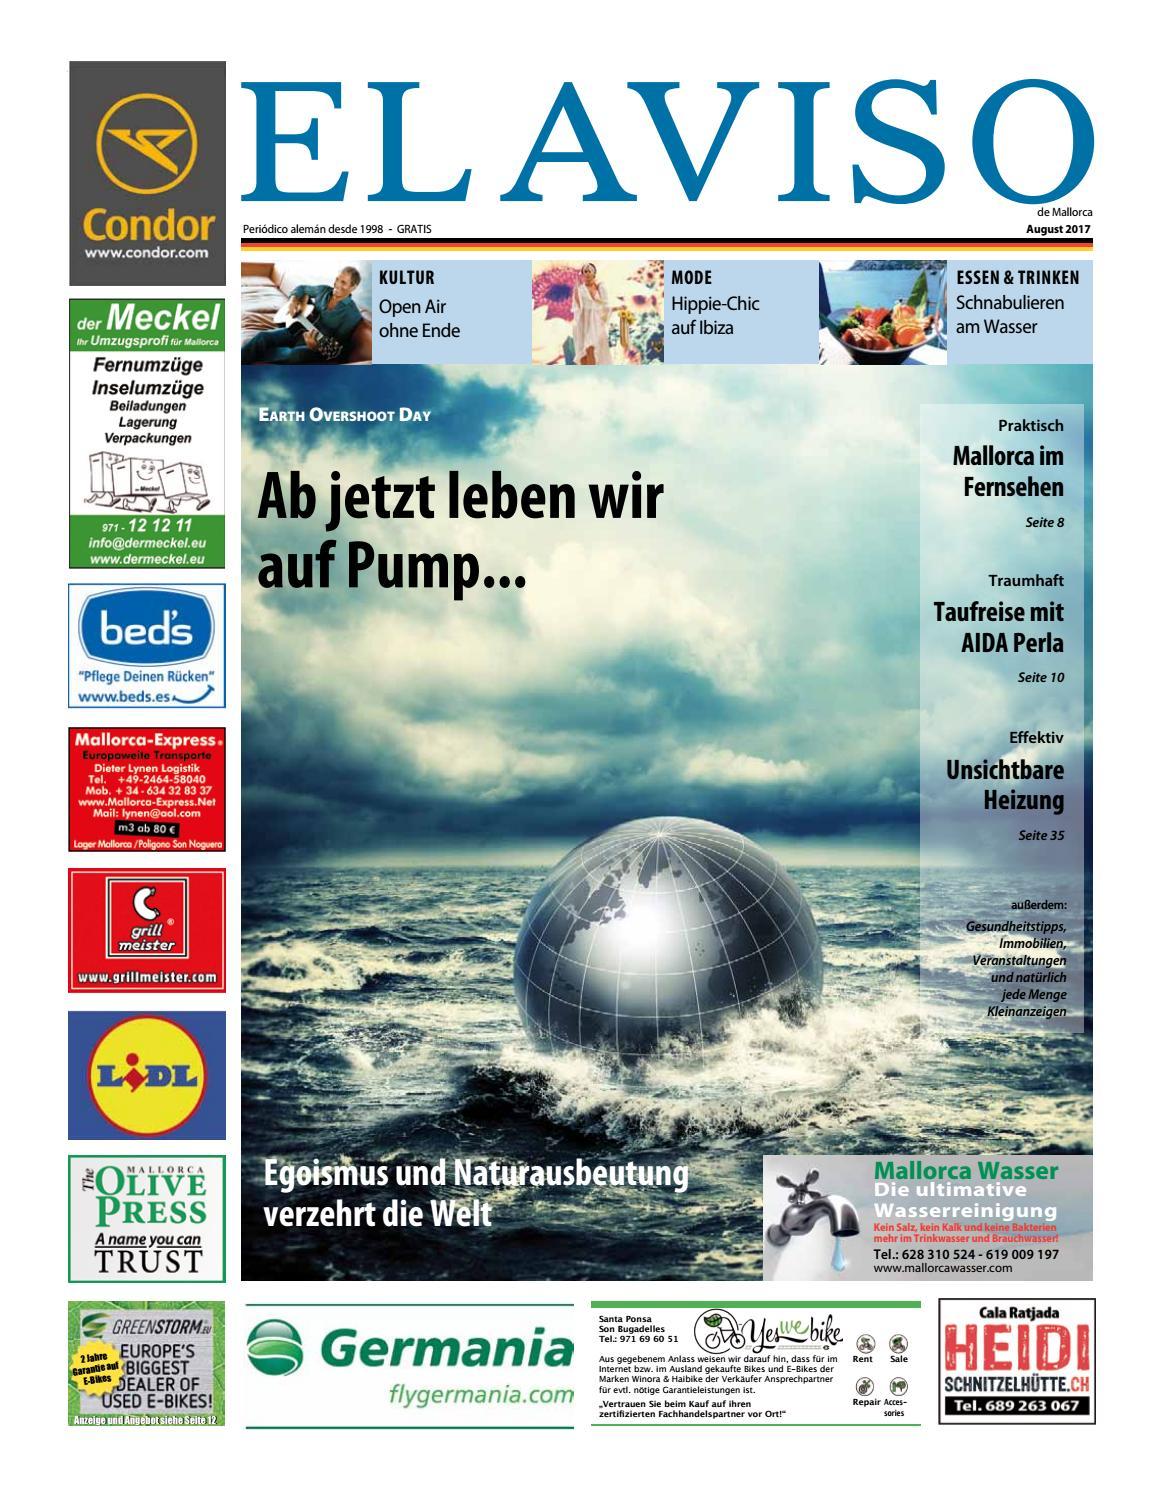 EL AVISO 08/2017 by Pixelmeister - issuu